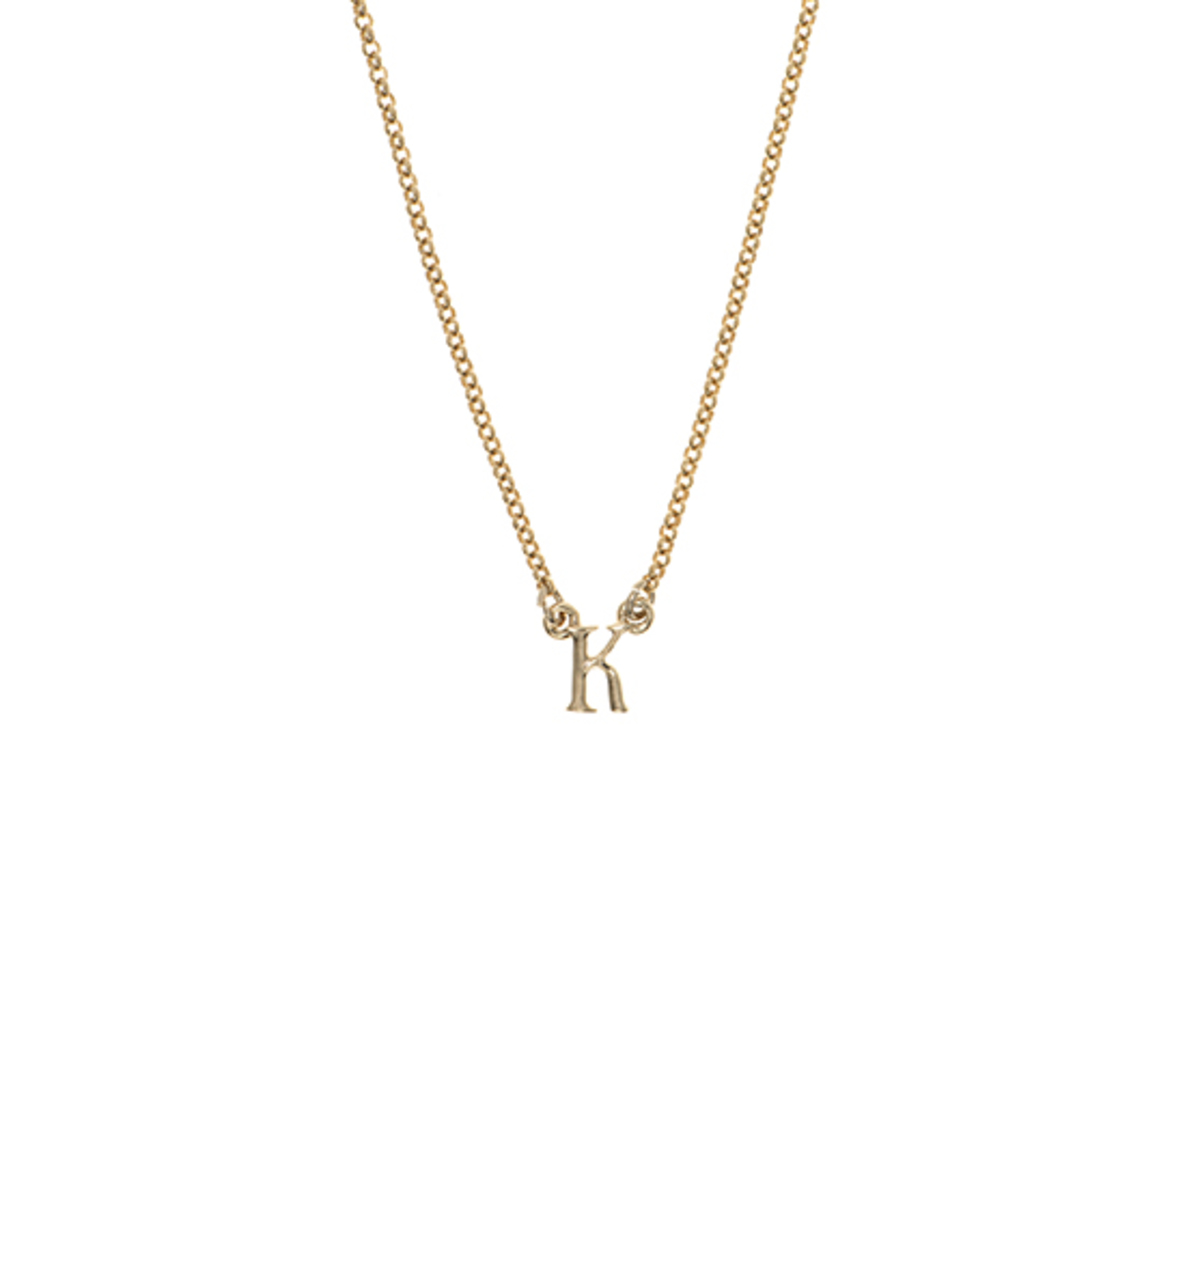 K for kindness necklace 3